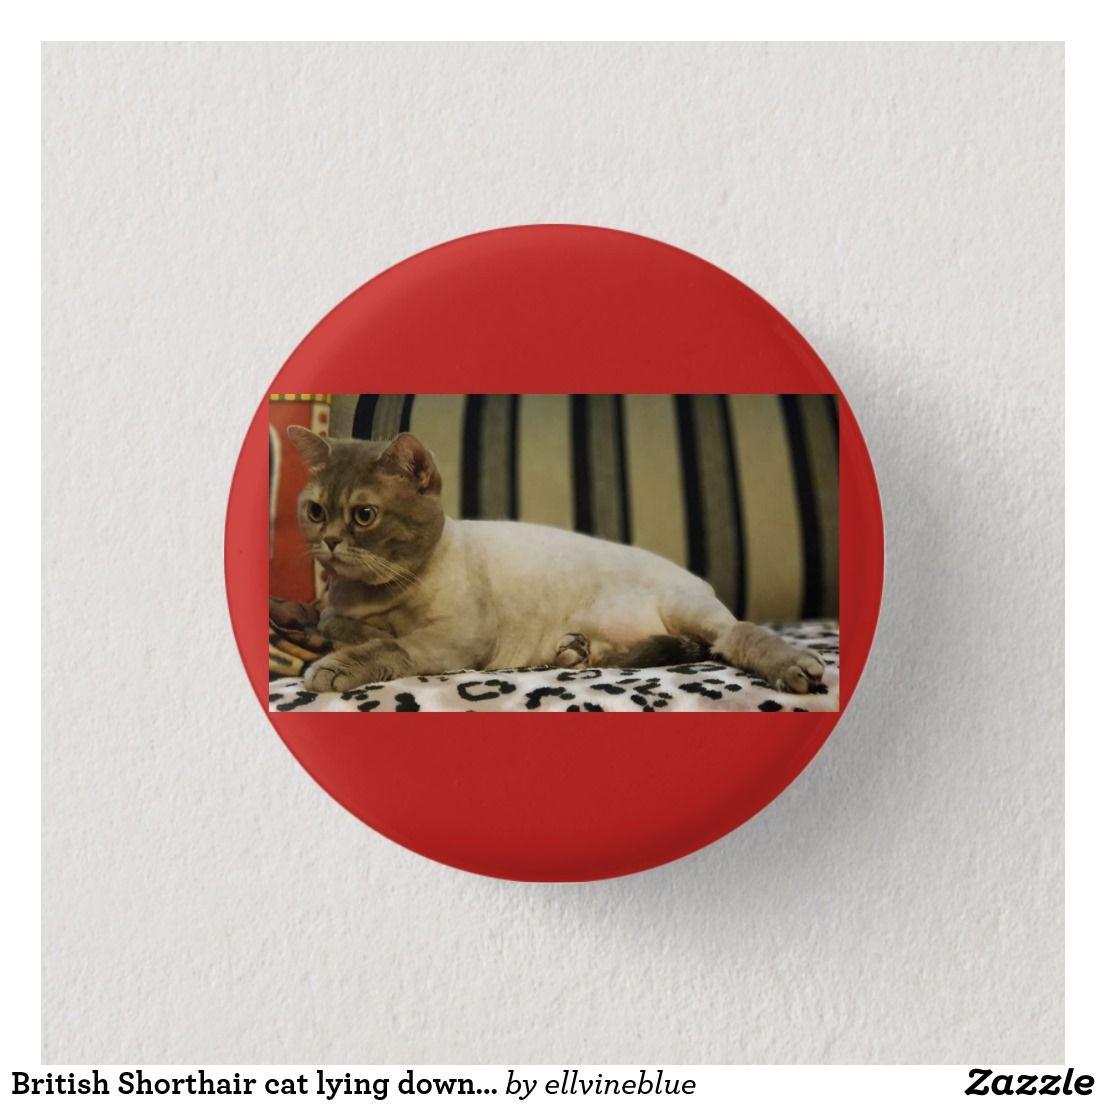 British Shorthair Cat Lying Down On Sofa 3 Cm Round Badge British Shorthair Cats British Shorthair Cat Love